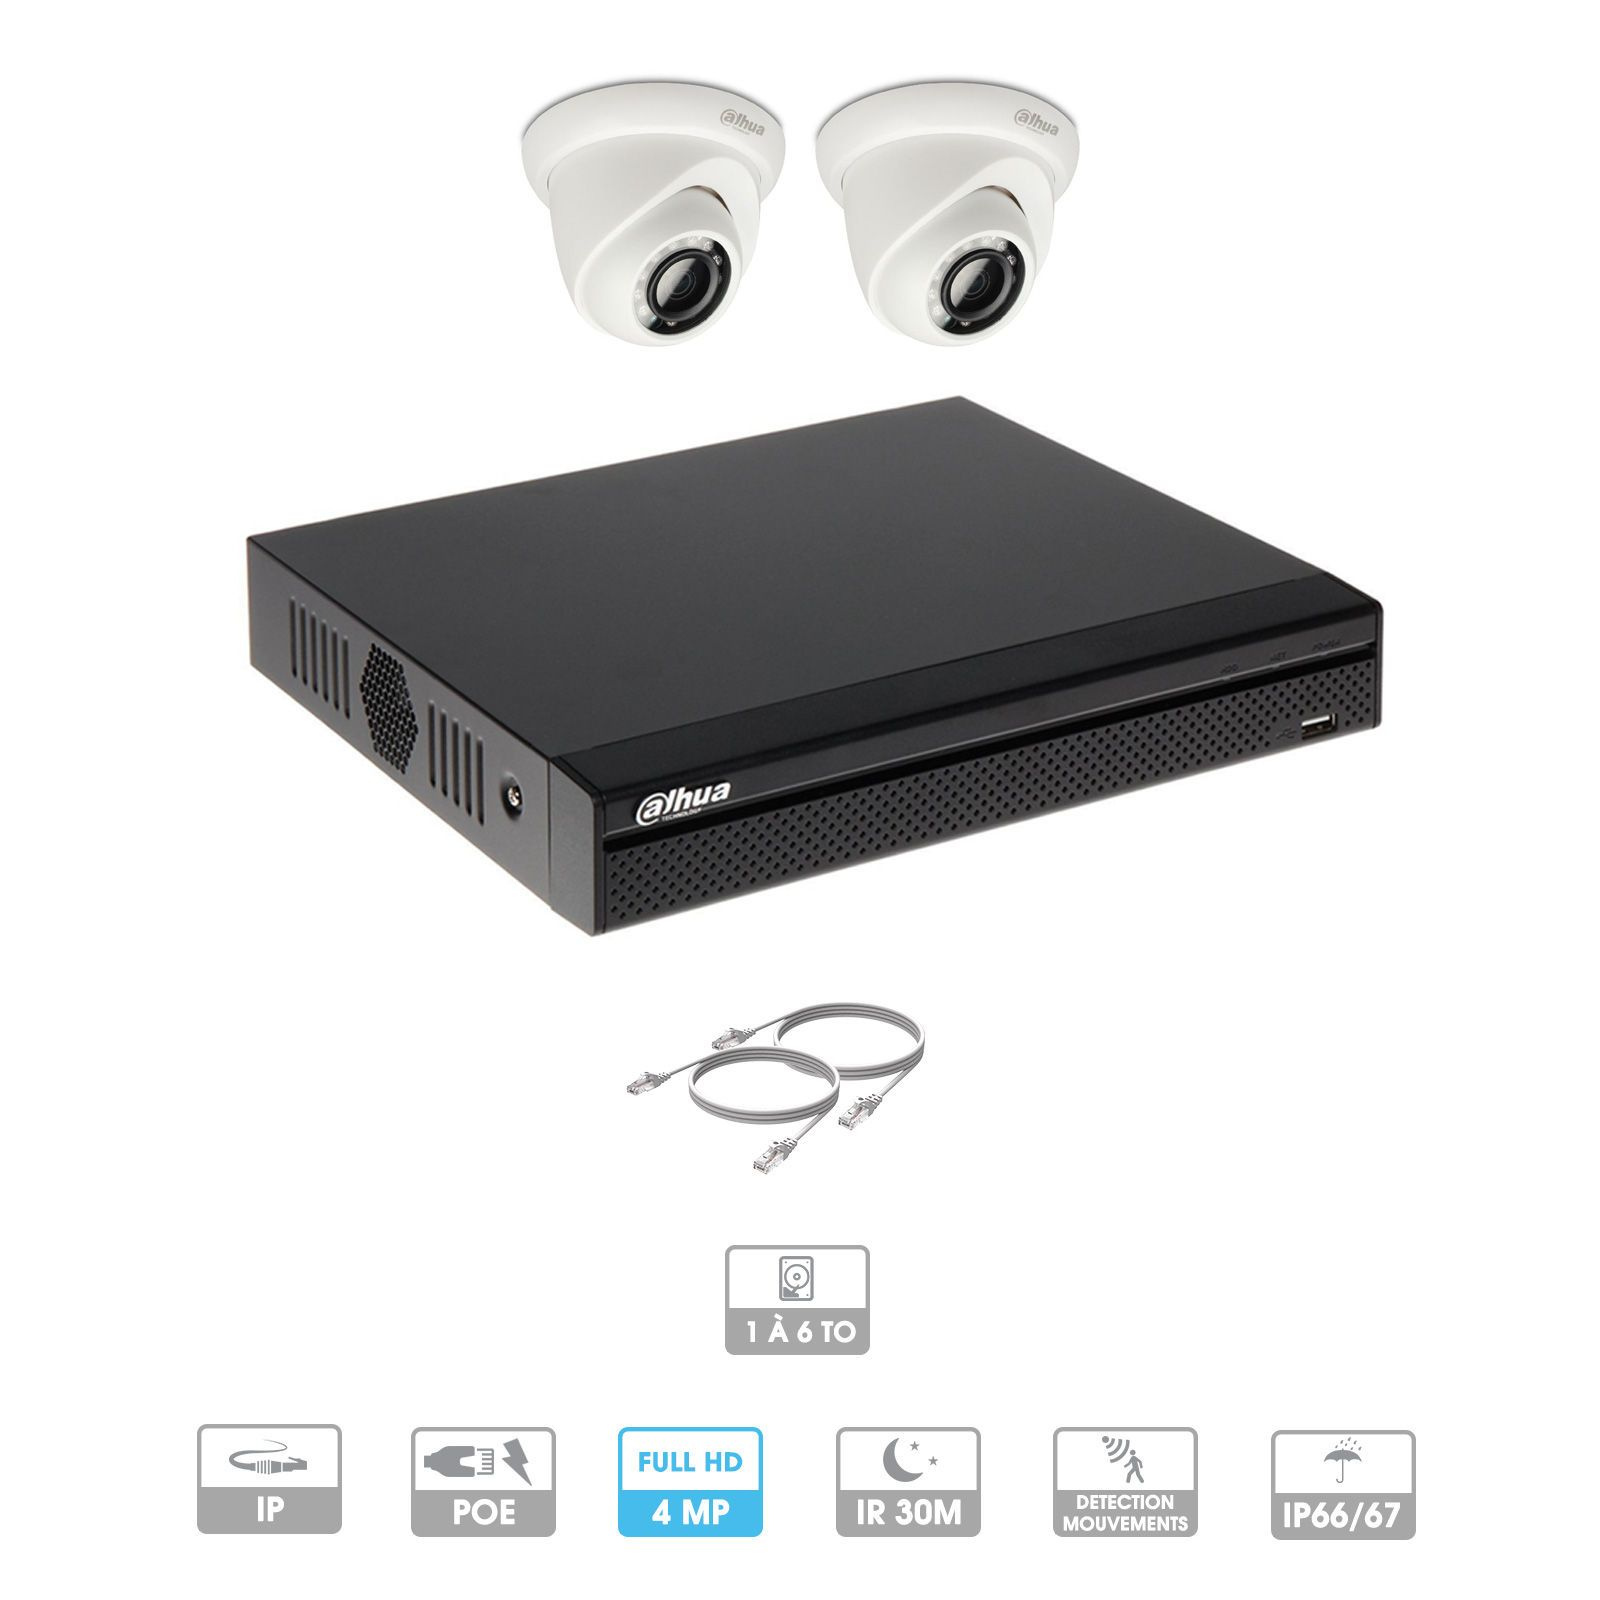 Kit vidéosurveillance 2 caméras | 4 MP | IP PoE | 2 câbles RJ45 20/30/40/50 mètres | 1 HDD 1 à 6 To | Dôme Dahua